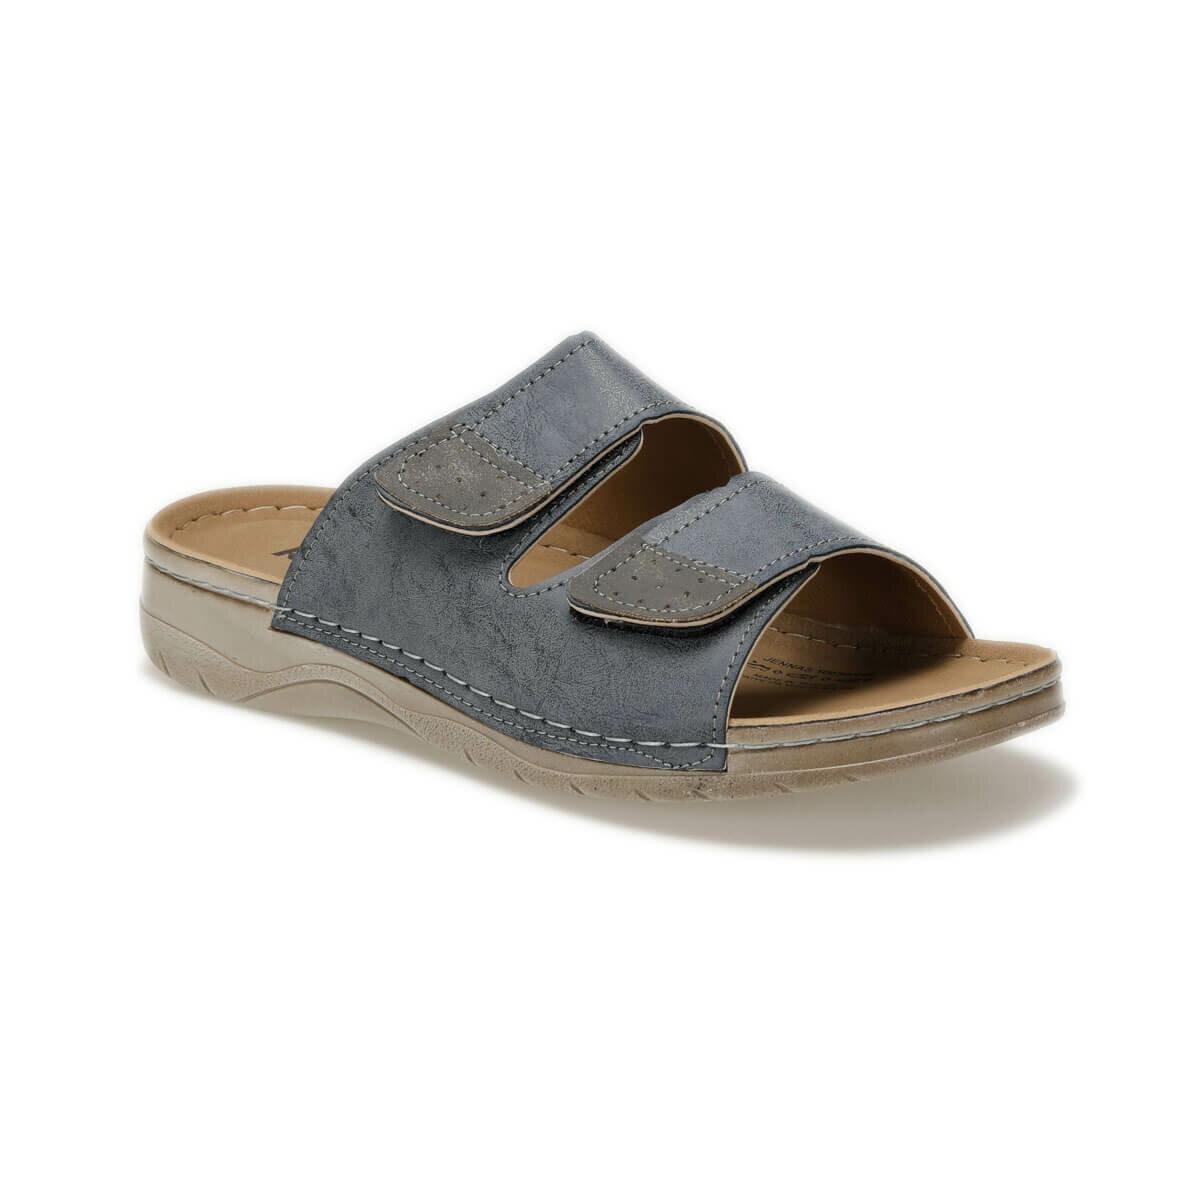 FLO Men Slippers New Arrival Summer Men Flip Flops High Quality Beach Sandals Anti-slip Zapatos Hombre Casual Shoes KINETIX JENNAS Navy Blue